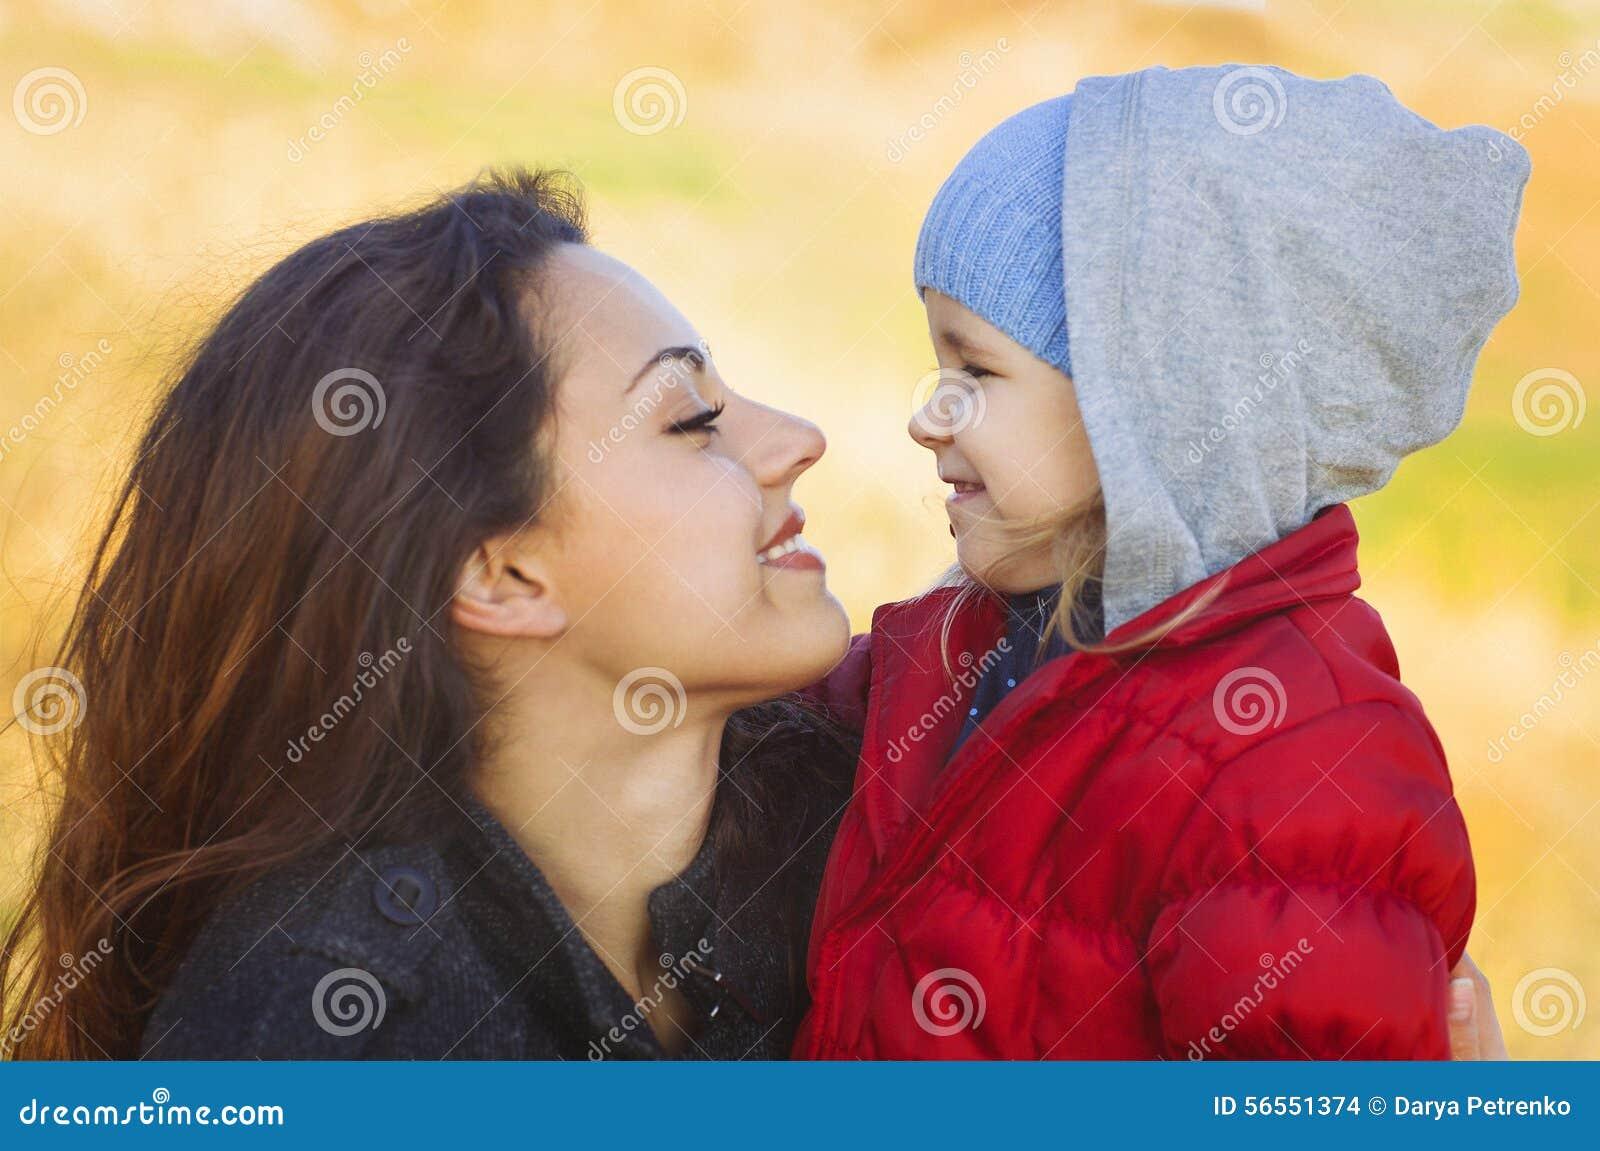 Download Ευτυχή Mum και κοριτσάκι που περπατούν στην παραλία το φθινόπωρο Στοκ Εικόνες - εικόνα από έξω, κατσίκι: 56551374